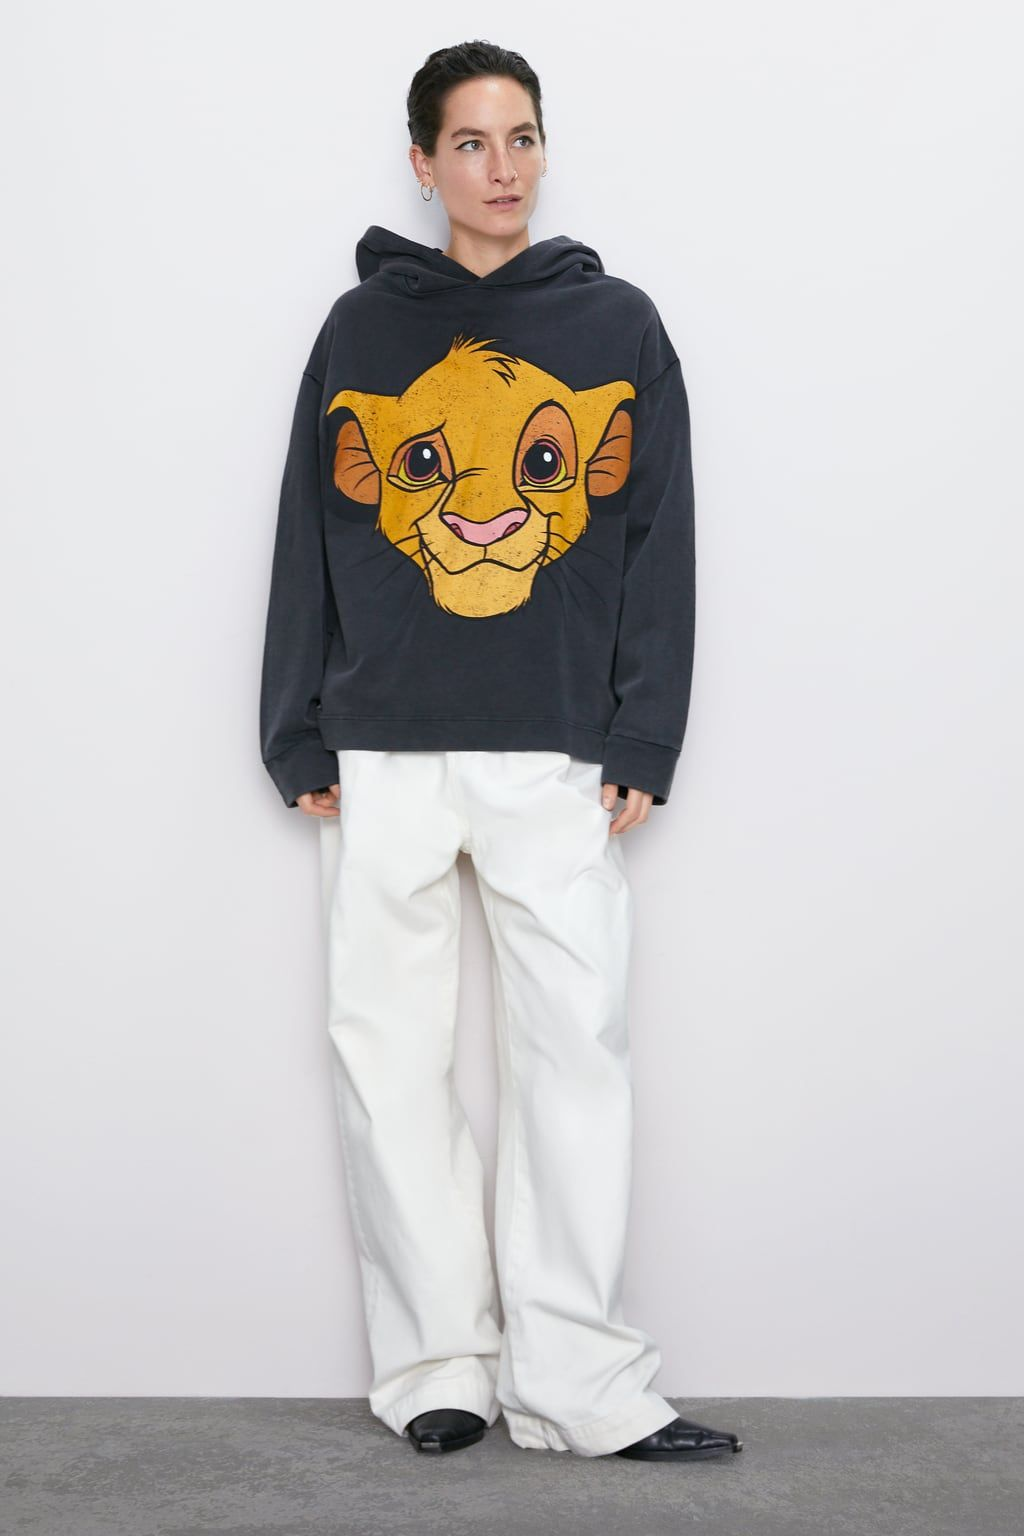 The Lion King C Disney Hoodie Hoodies Sweatshirts Woman Zara Greece Lion King Clothes Disney Hoodies Hoodies [ 1536 x 1024 Pixel ]